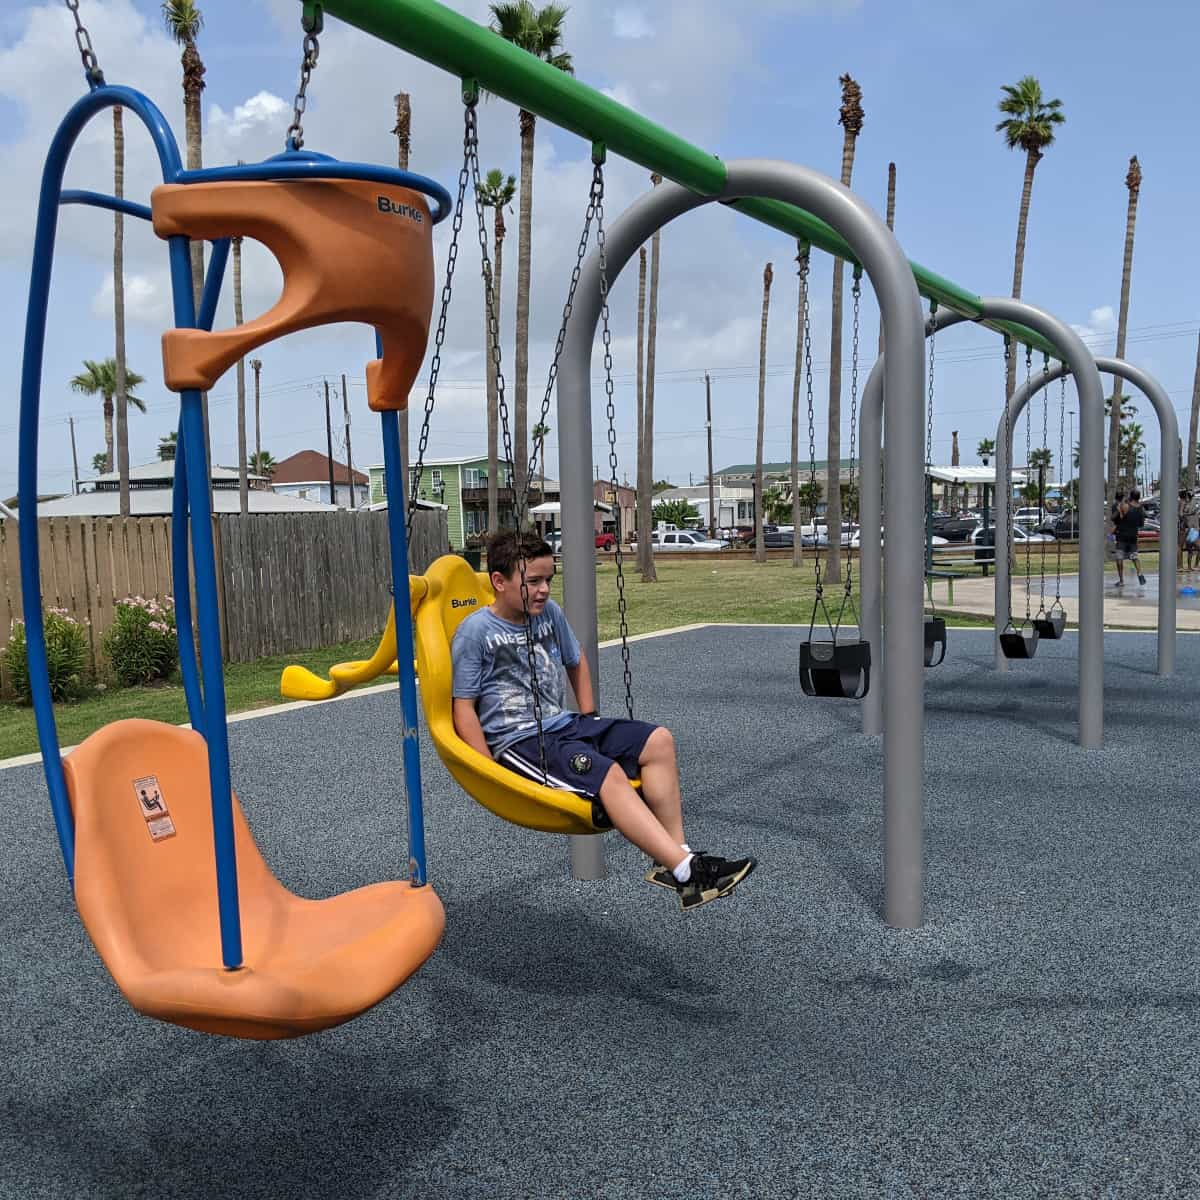 Menard Park Galveston Swings